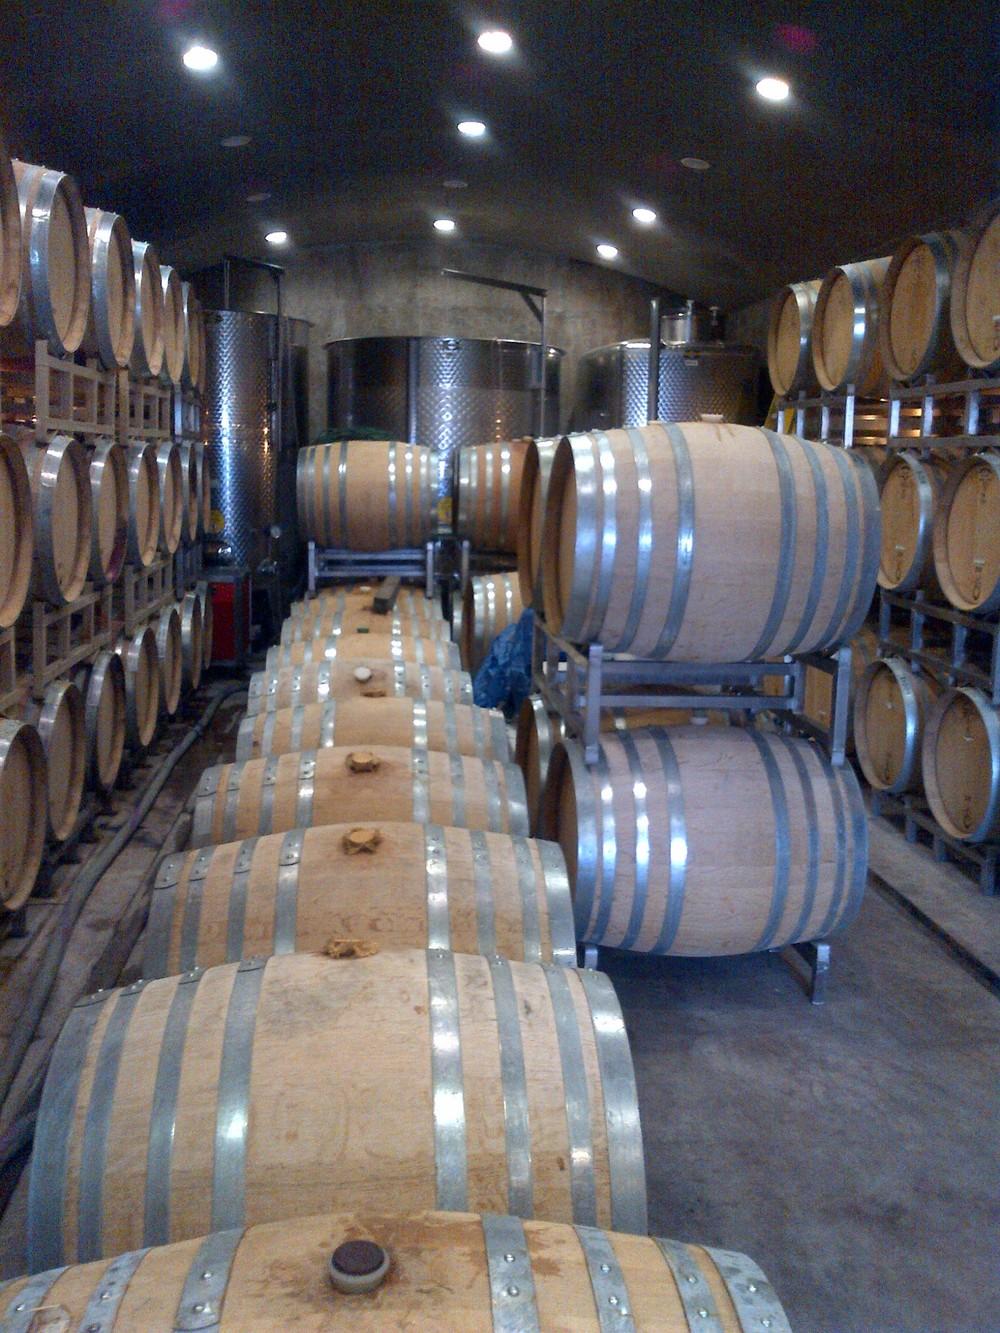 Inside the Foxtrot cellar...